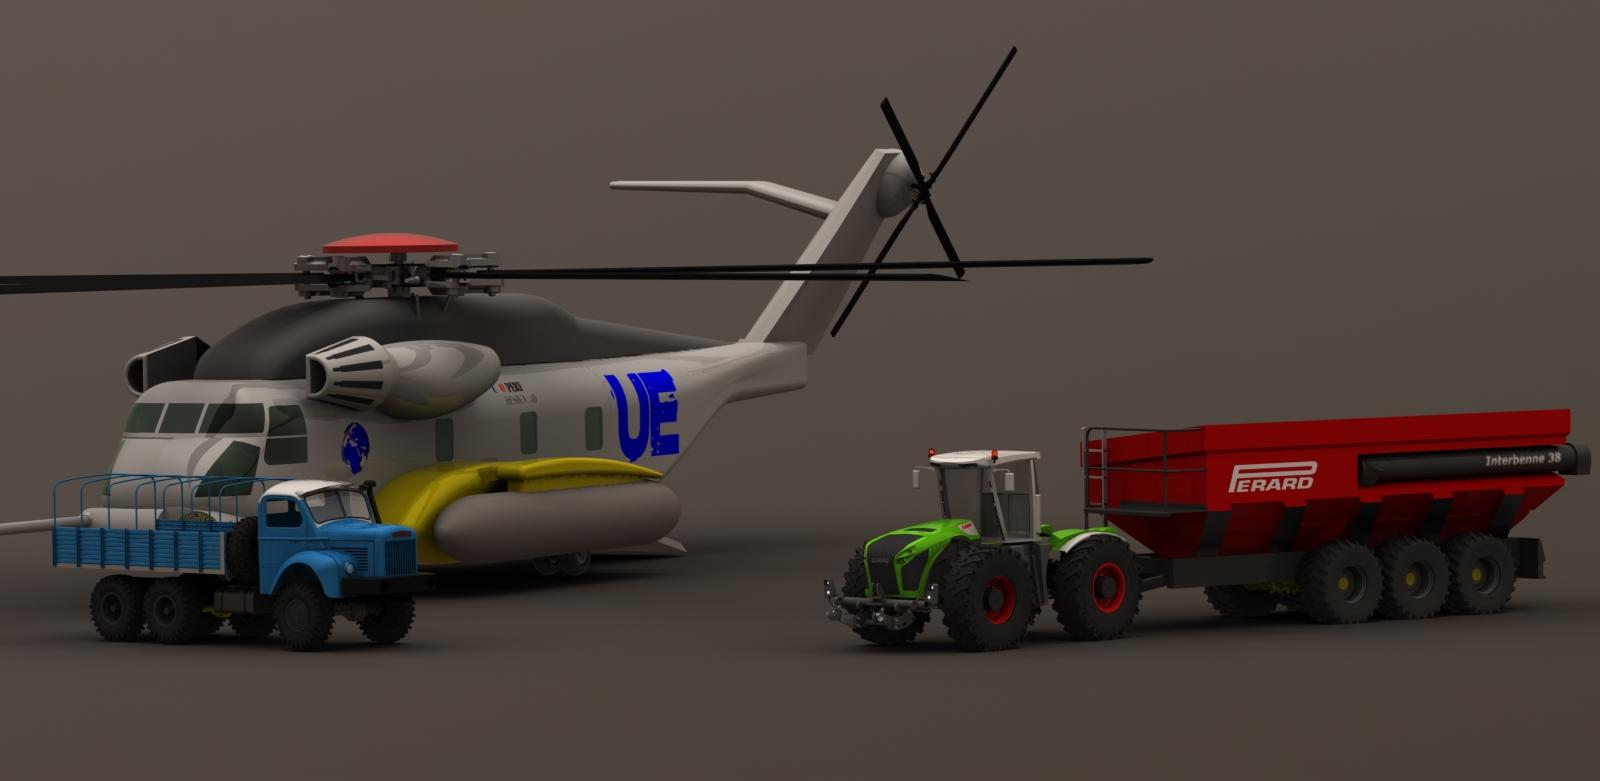 construction XERION echelle 1/8em R/C - Page 5 Sikorsky.10